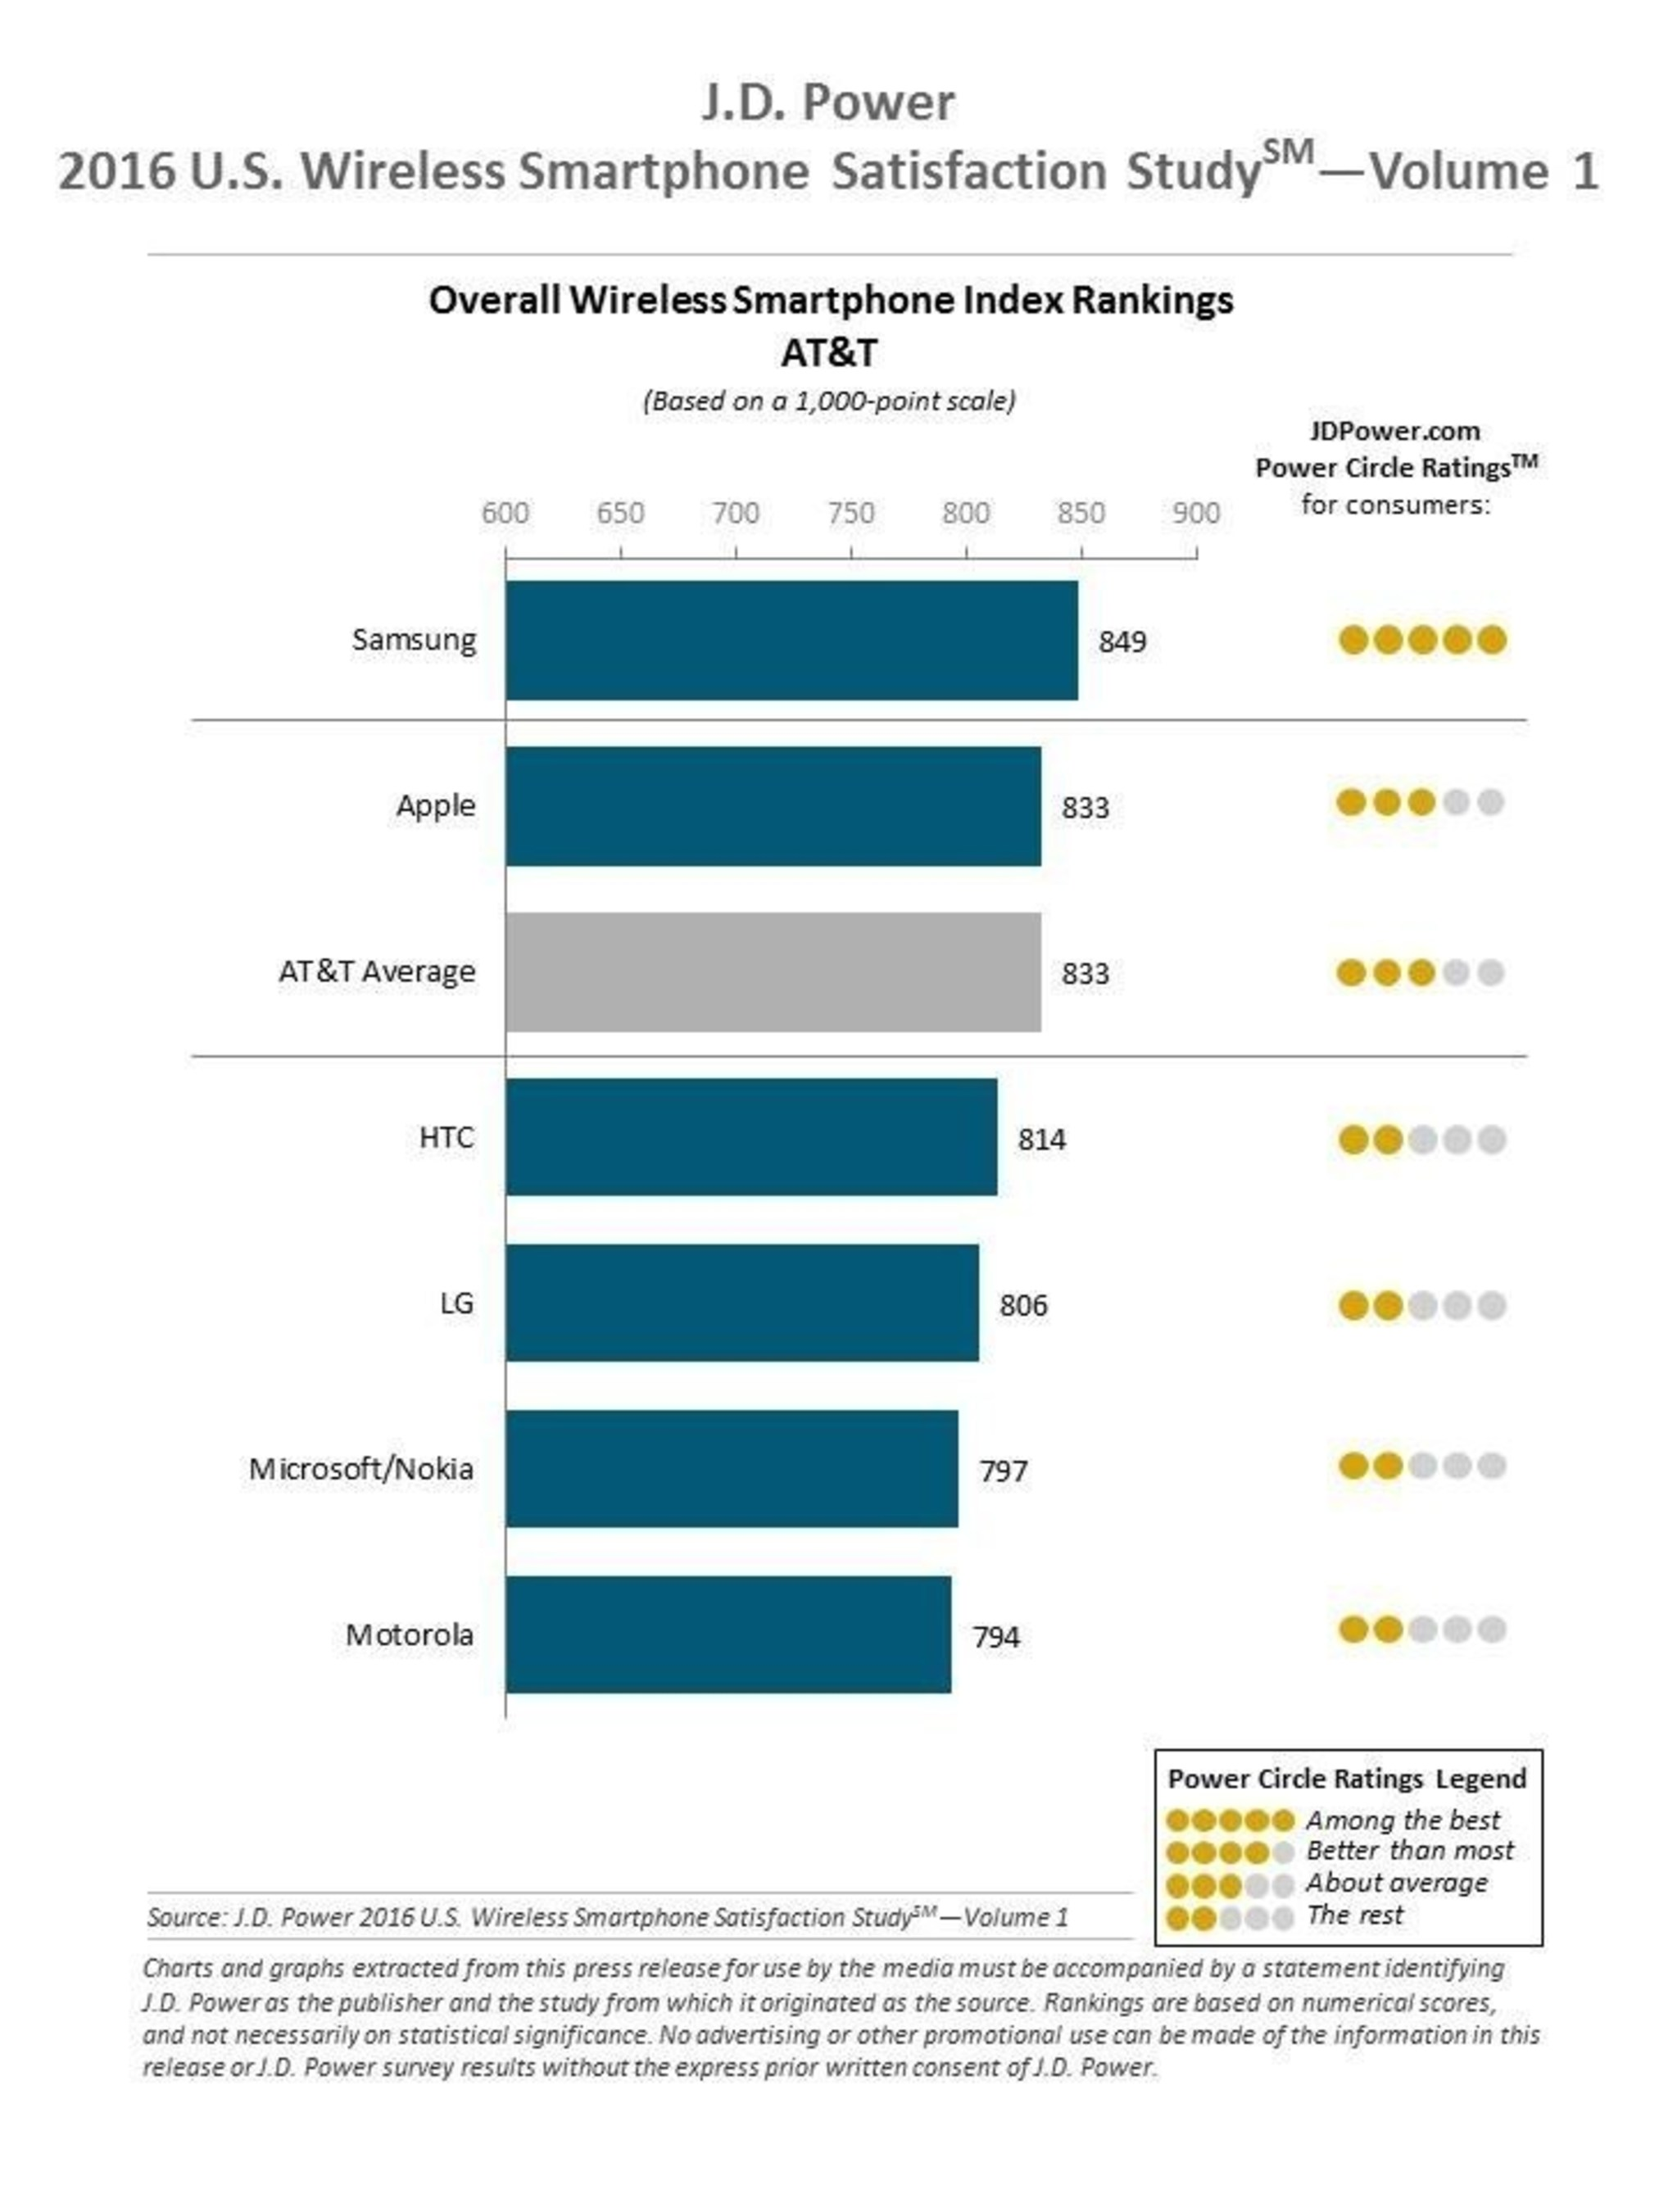 2016 J.D. Power Wireless Smartphone Ranking AT&T